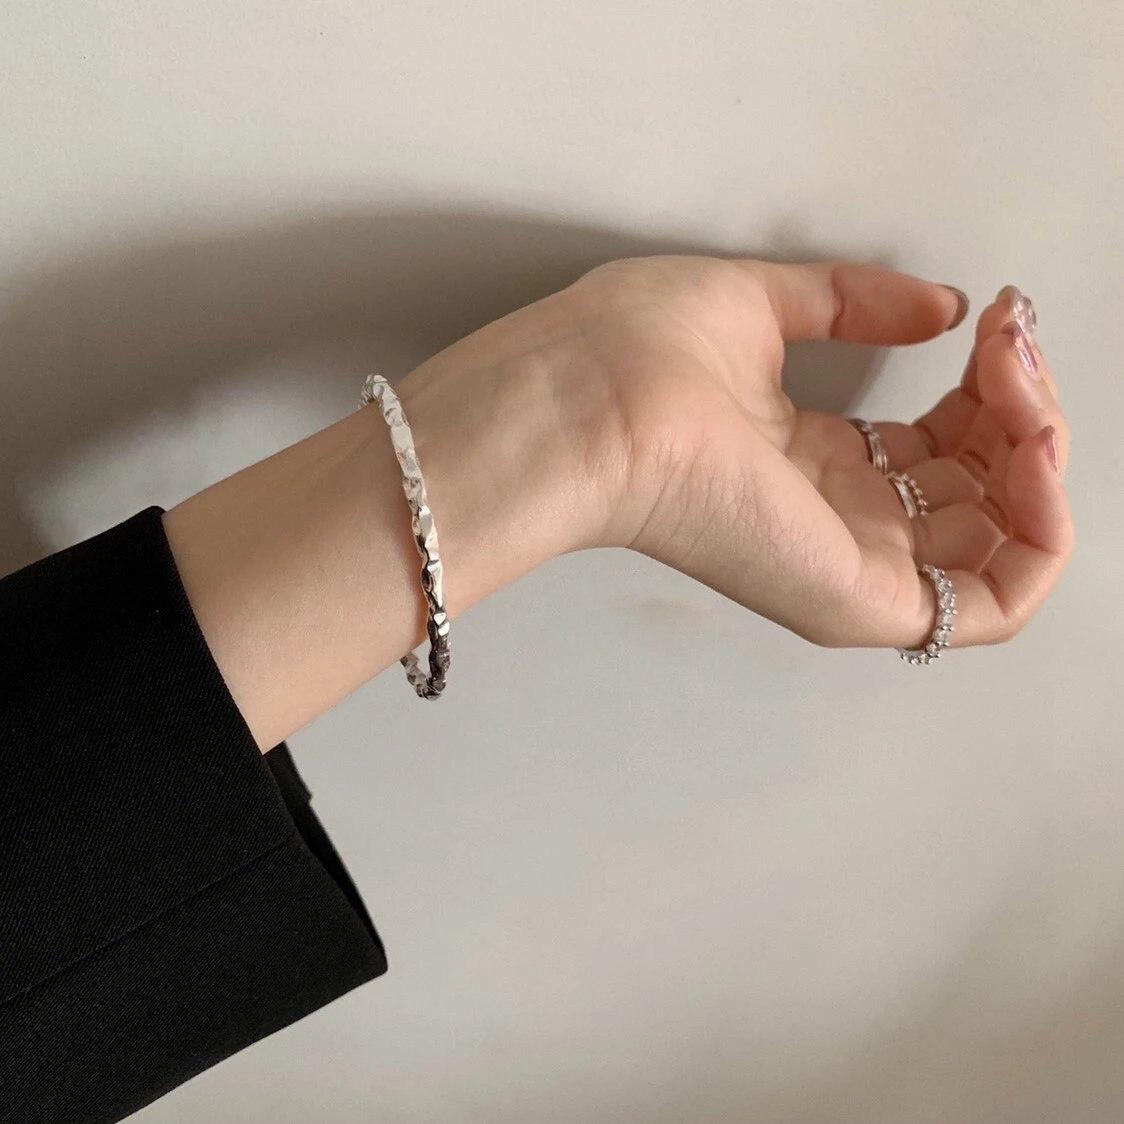 Brazaletes de zirconia Azul Mate hechos a mano para mujeres, brazaletes con textura de Plata Irregular esterlina 925, joyería de regalo para cumpleaños de Corea